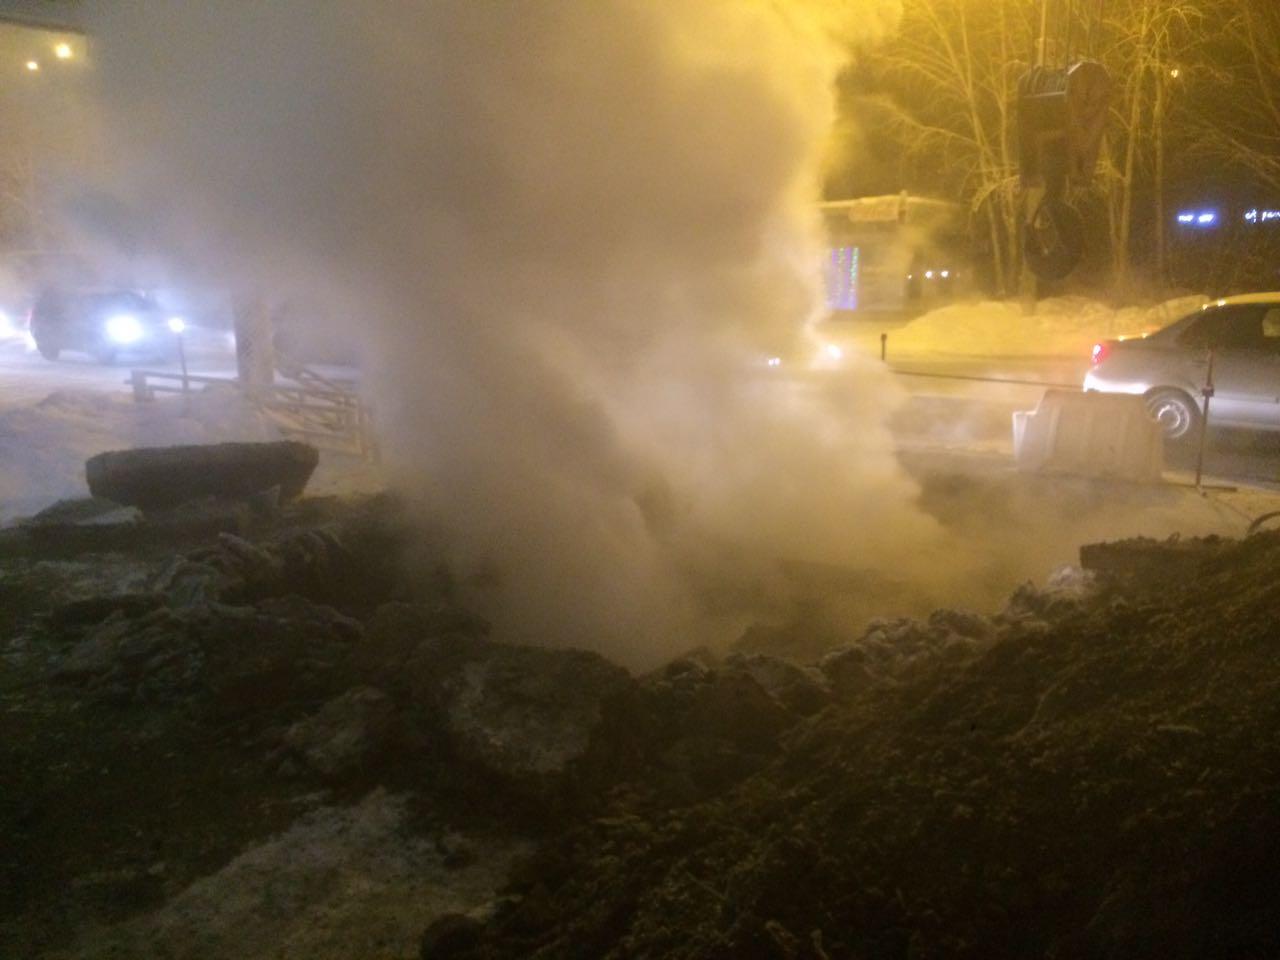 Мороз минус 33: вЕкатеринбурге 20 домов лишились тепла